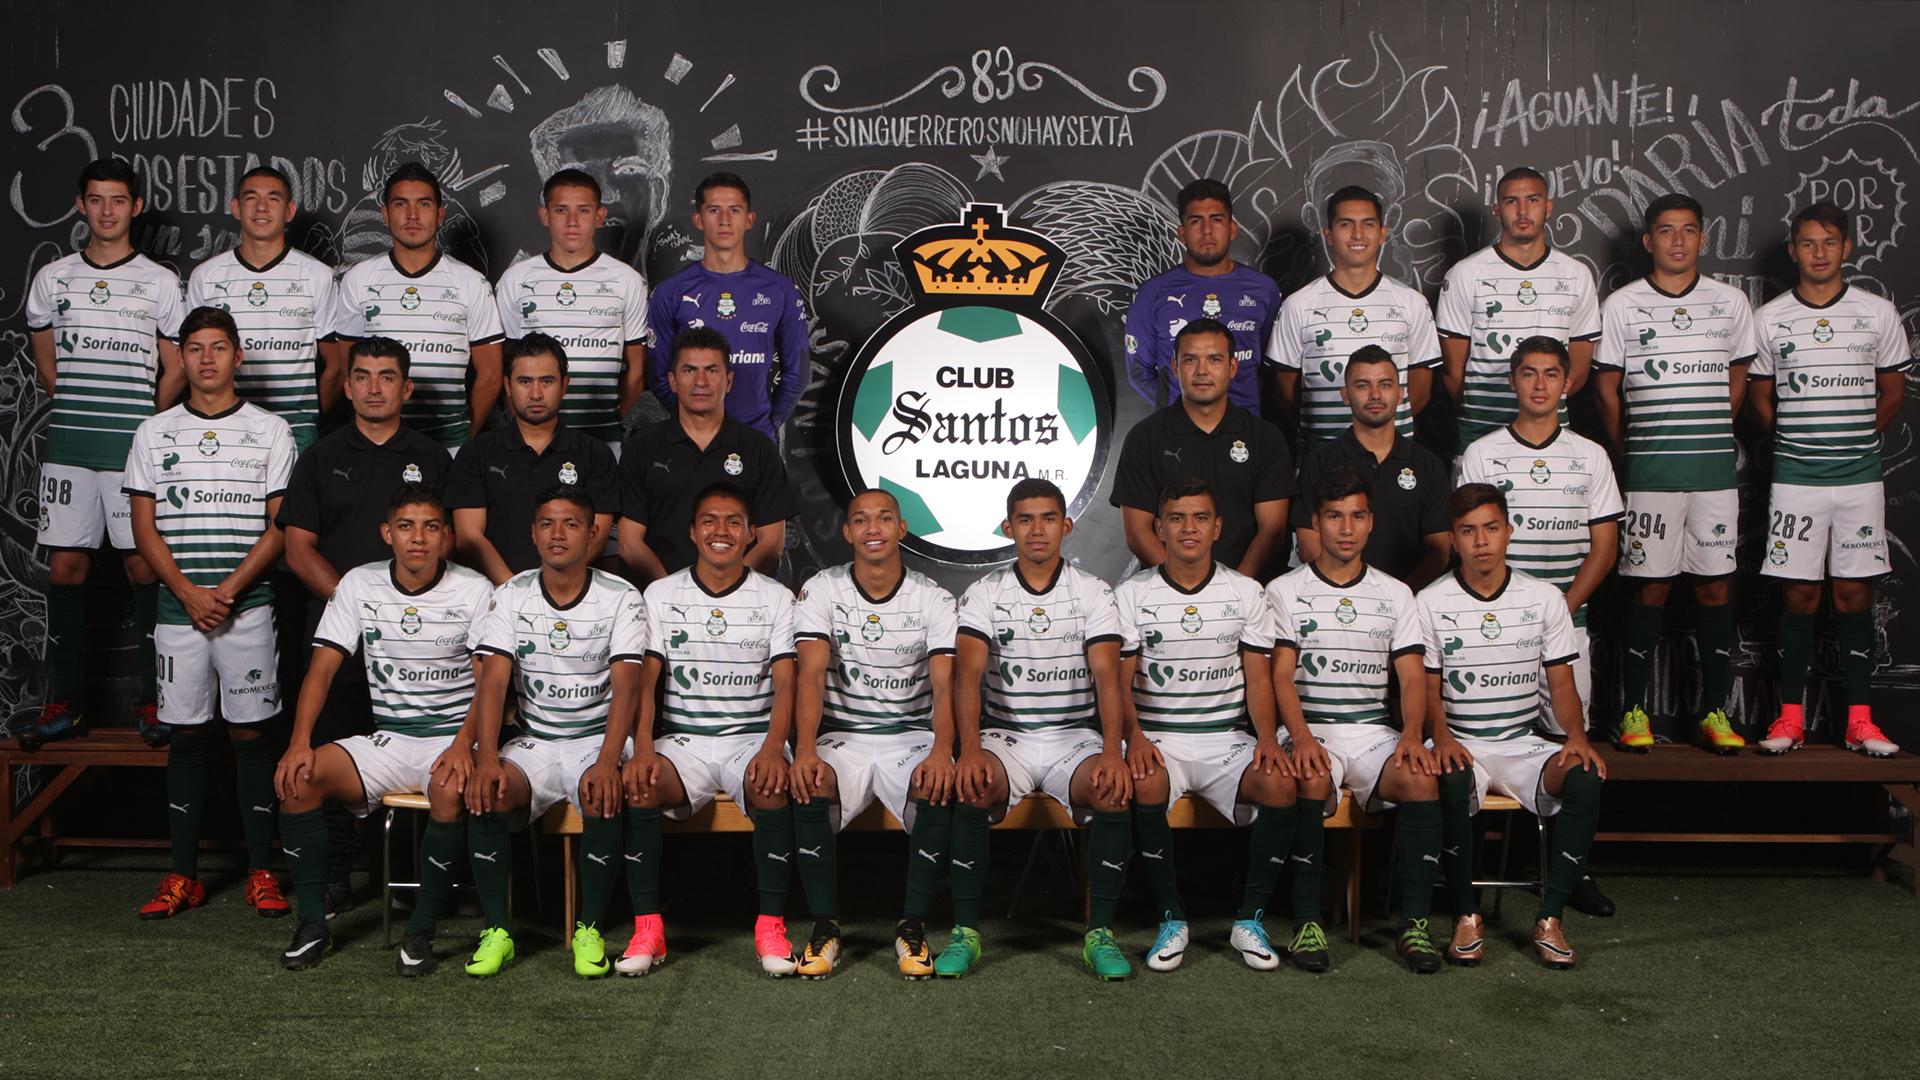 Club Santos Laguna Sub 20